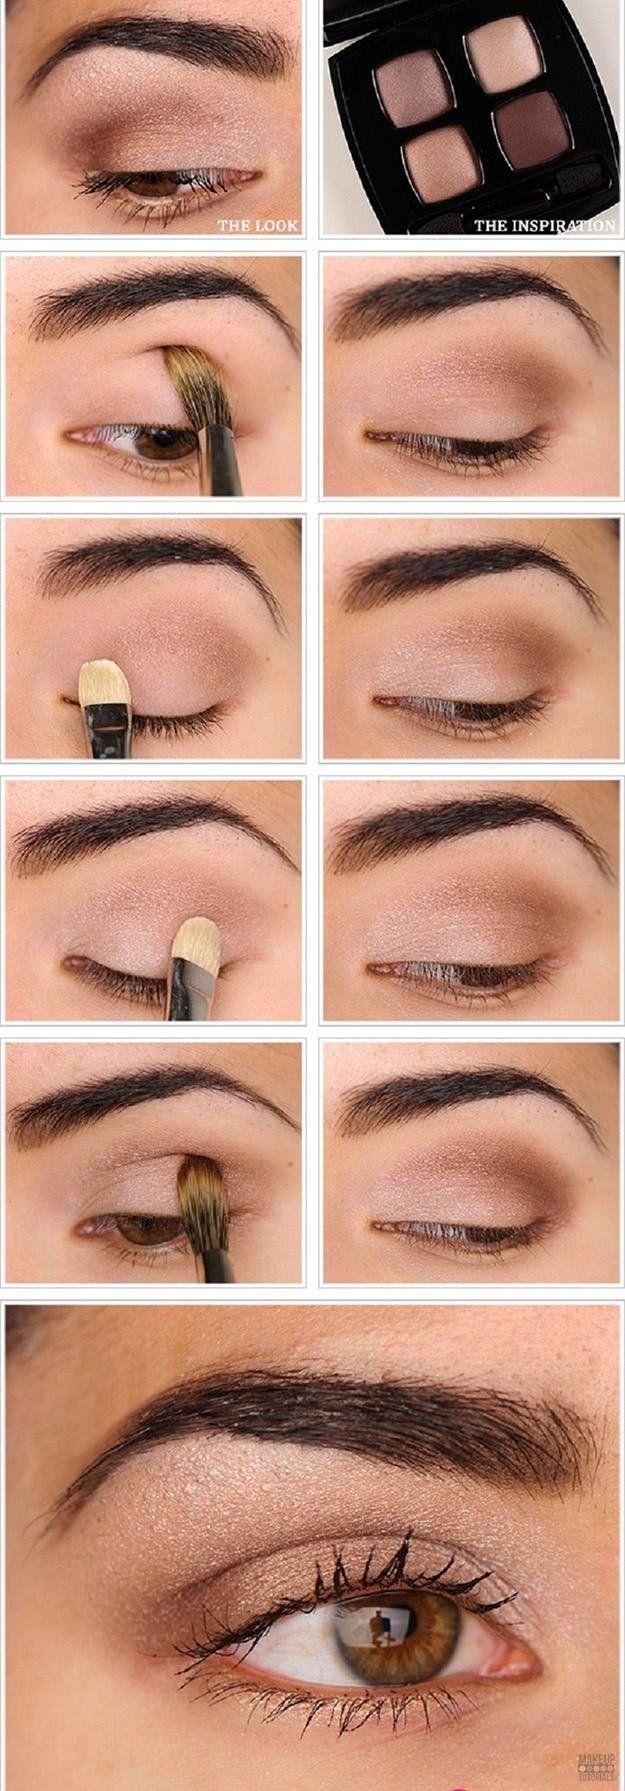 natural makeup tutorial Source by robinhamstra   …